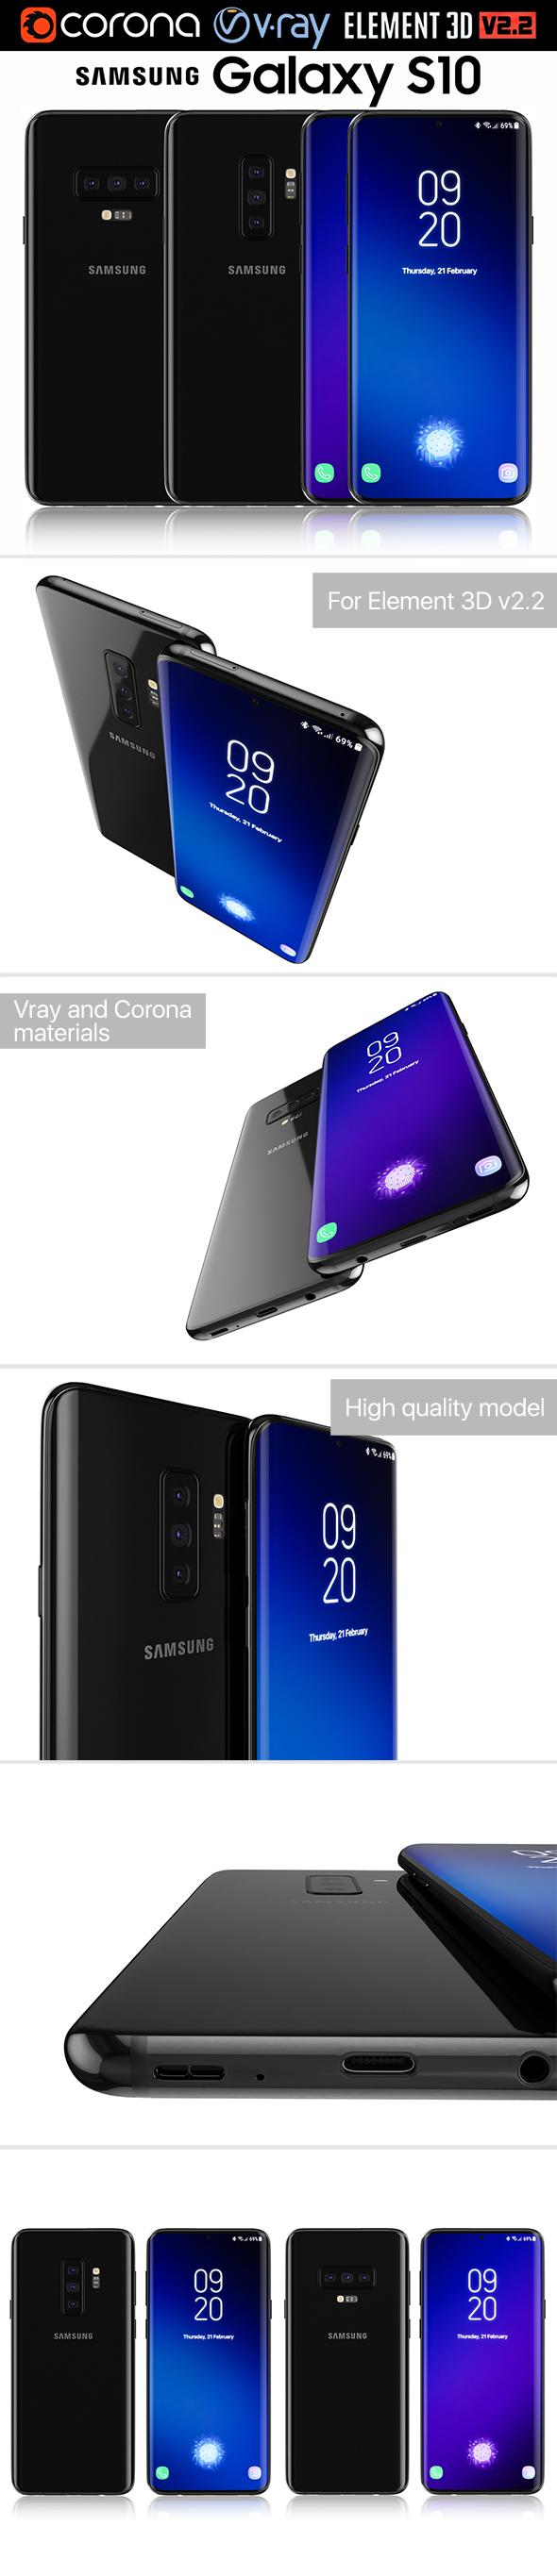 Samsung GALAXY S10 - 3DOcean Item for Sale